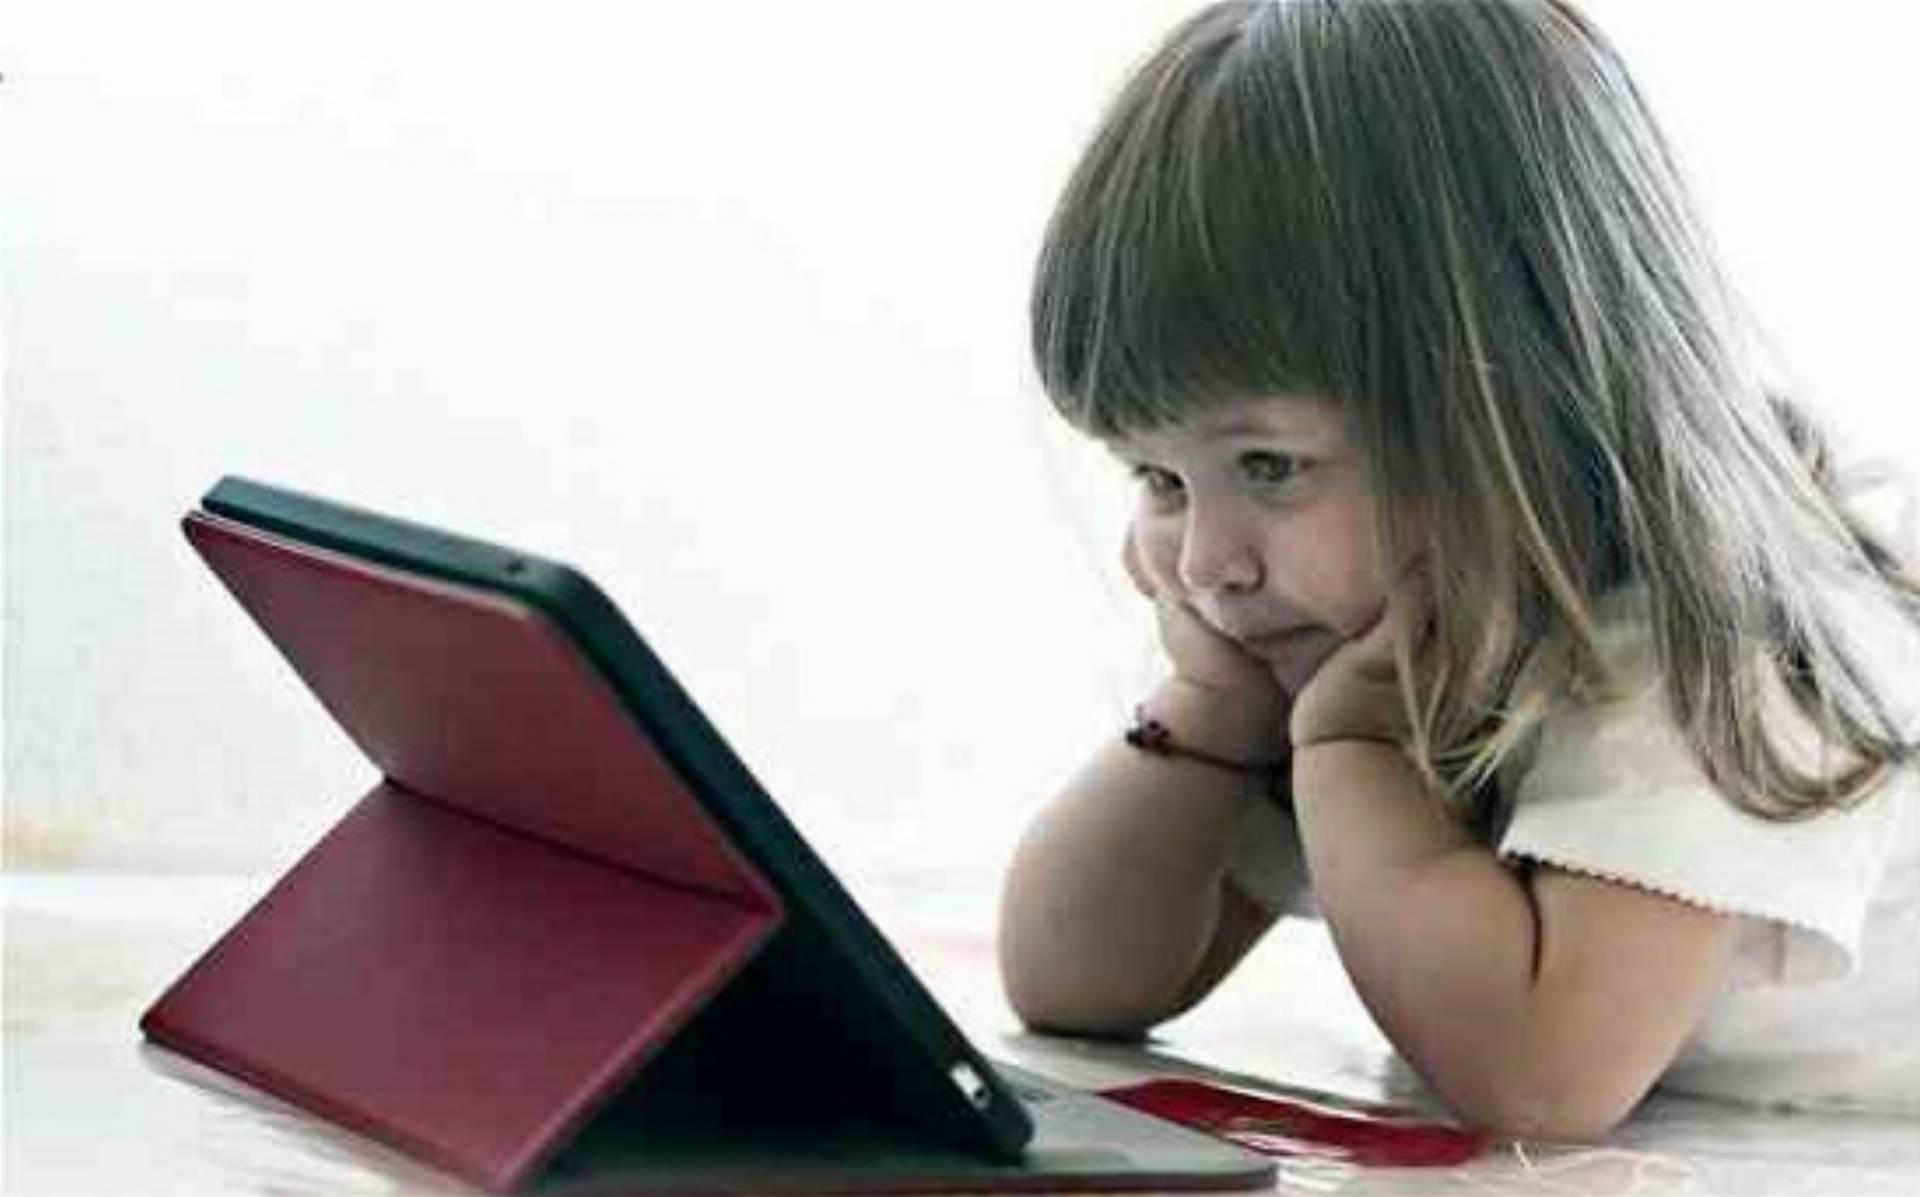 Monitoring online